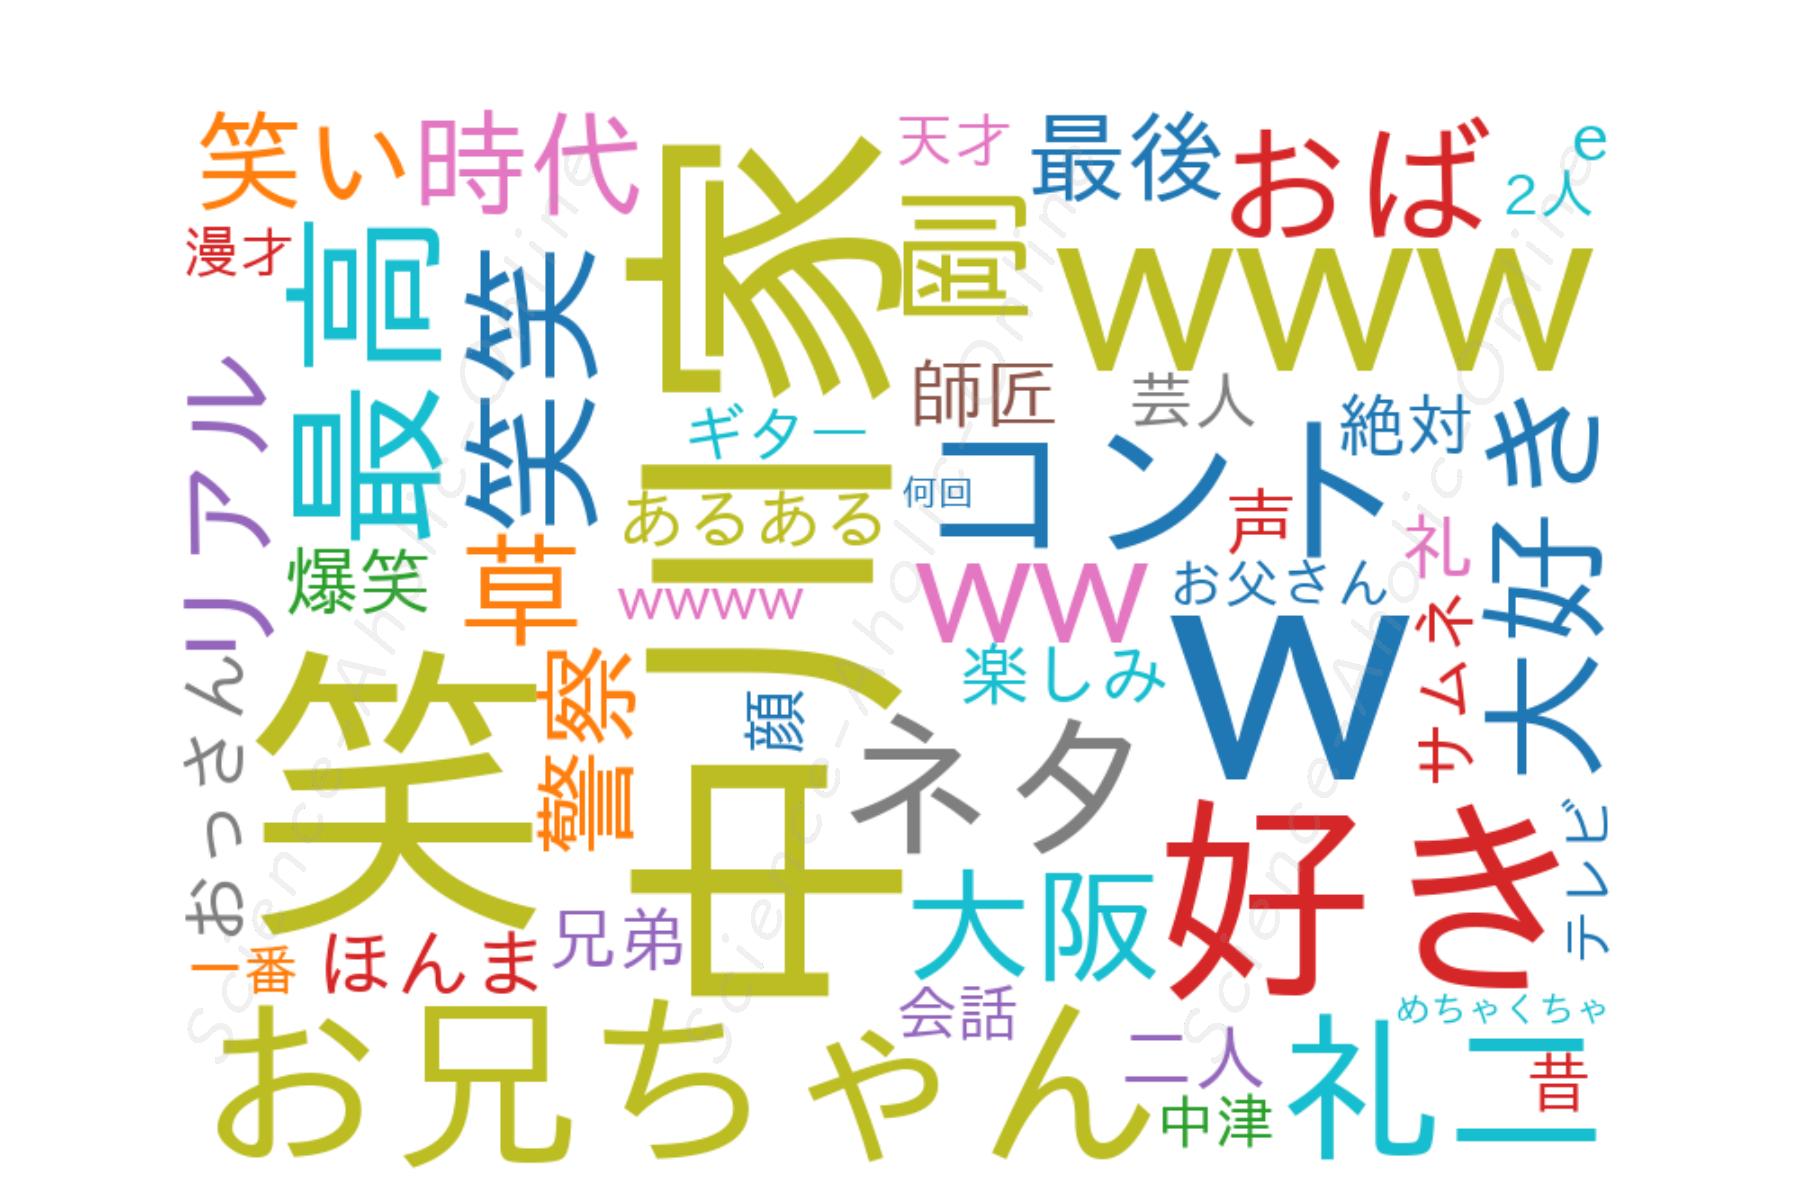 https://science-aholic-online.com/wp-content/uploads/2020/08/wordcloud_中川家チャンネル.png